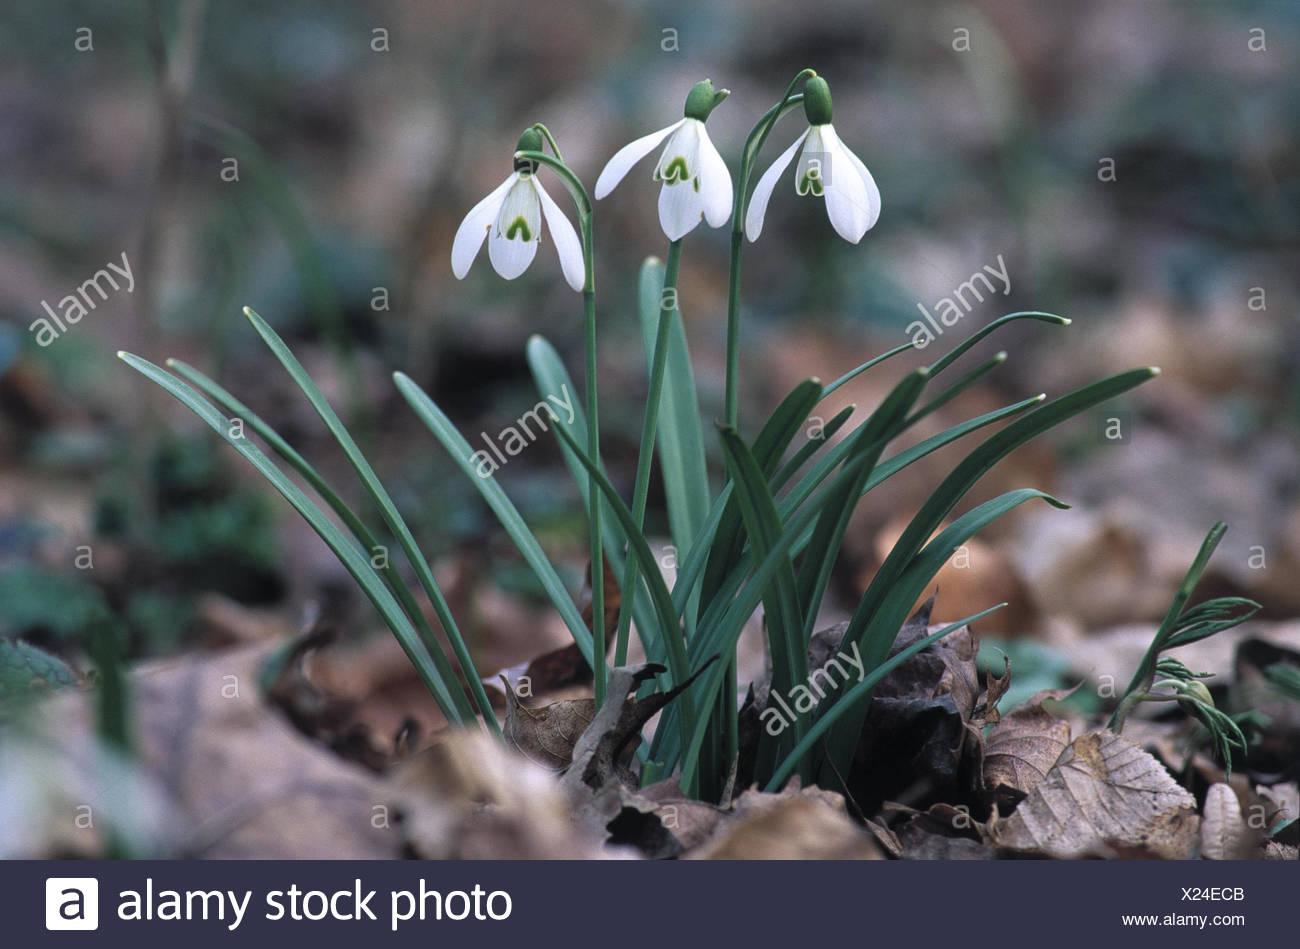 Snow Little Bells Galanthus Nivalis Flower Spring Flowers Spring